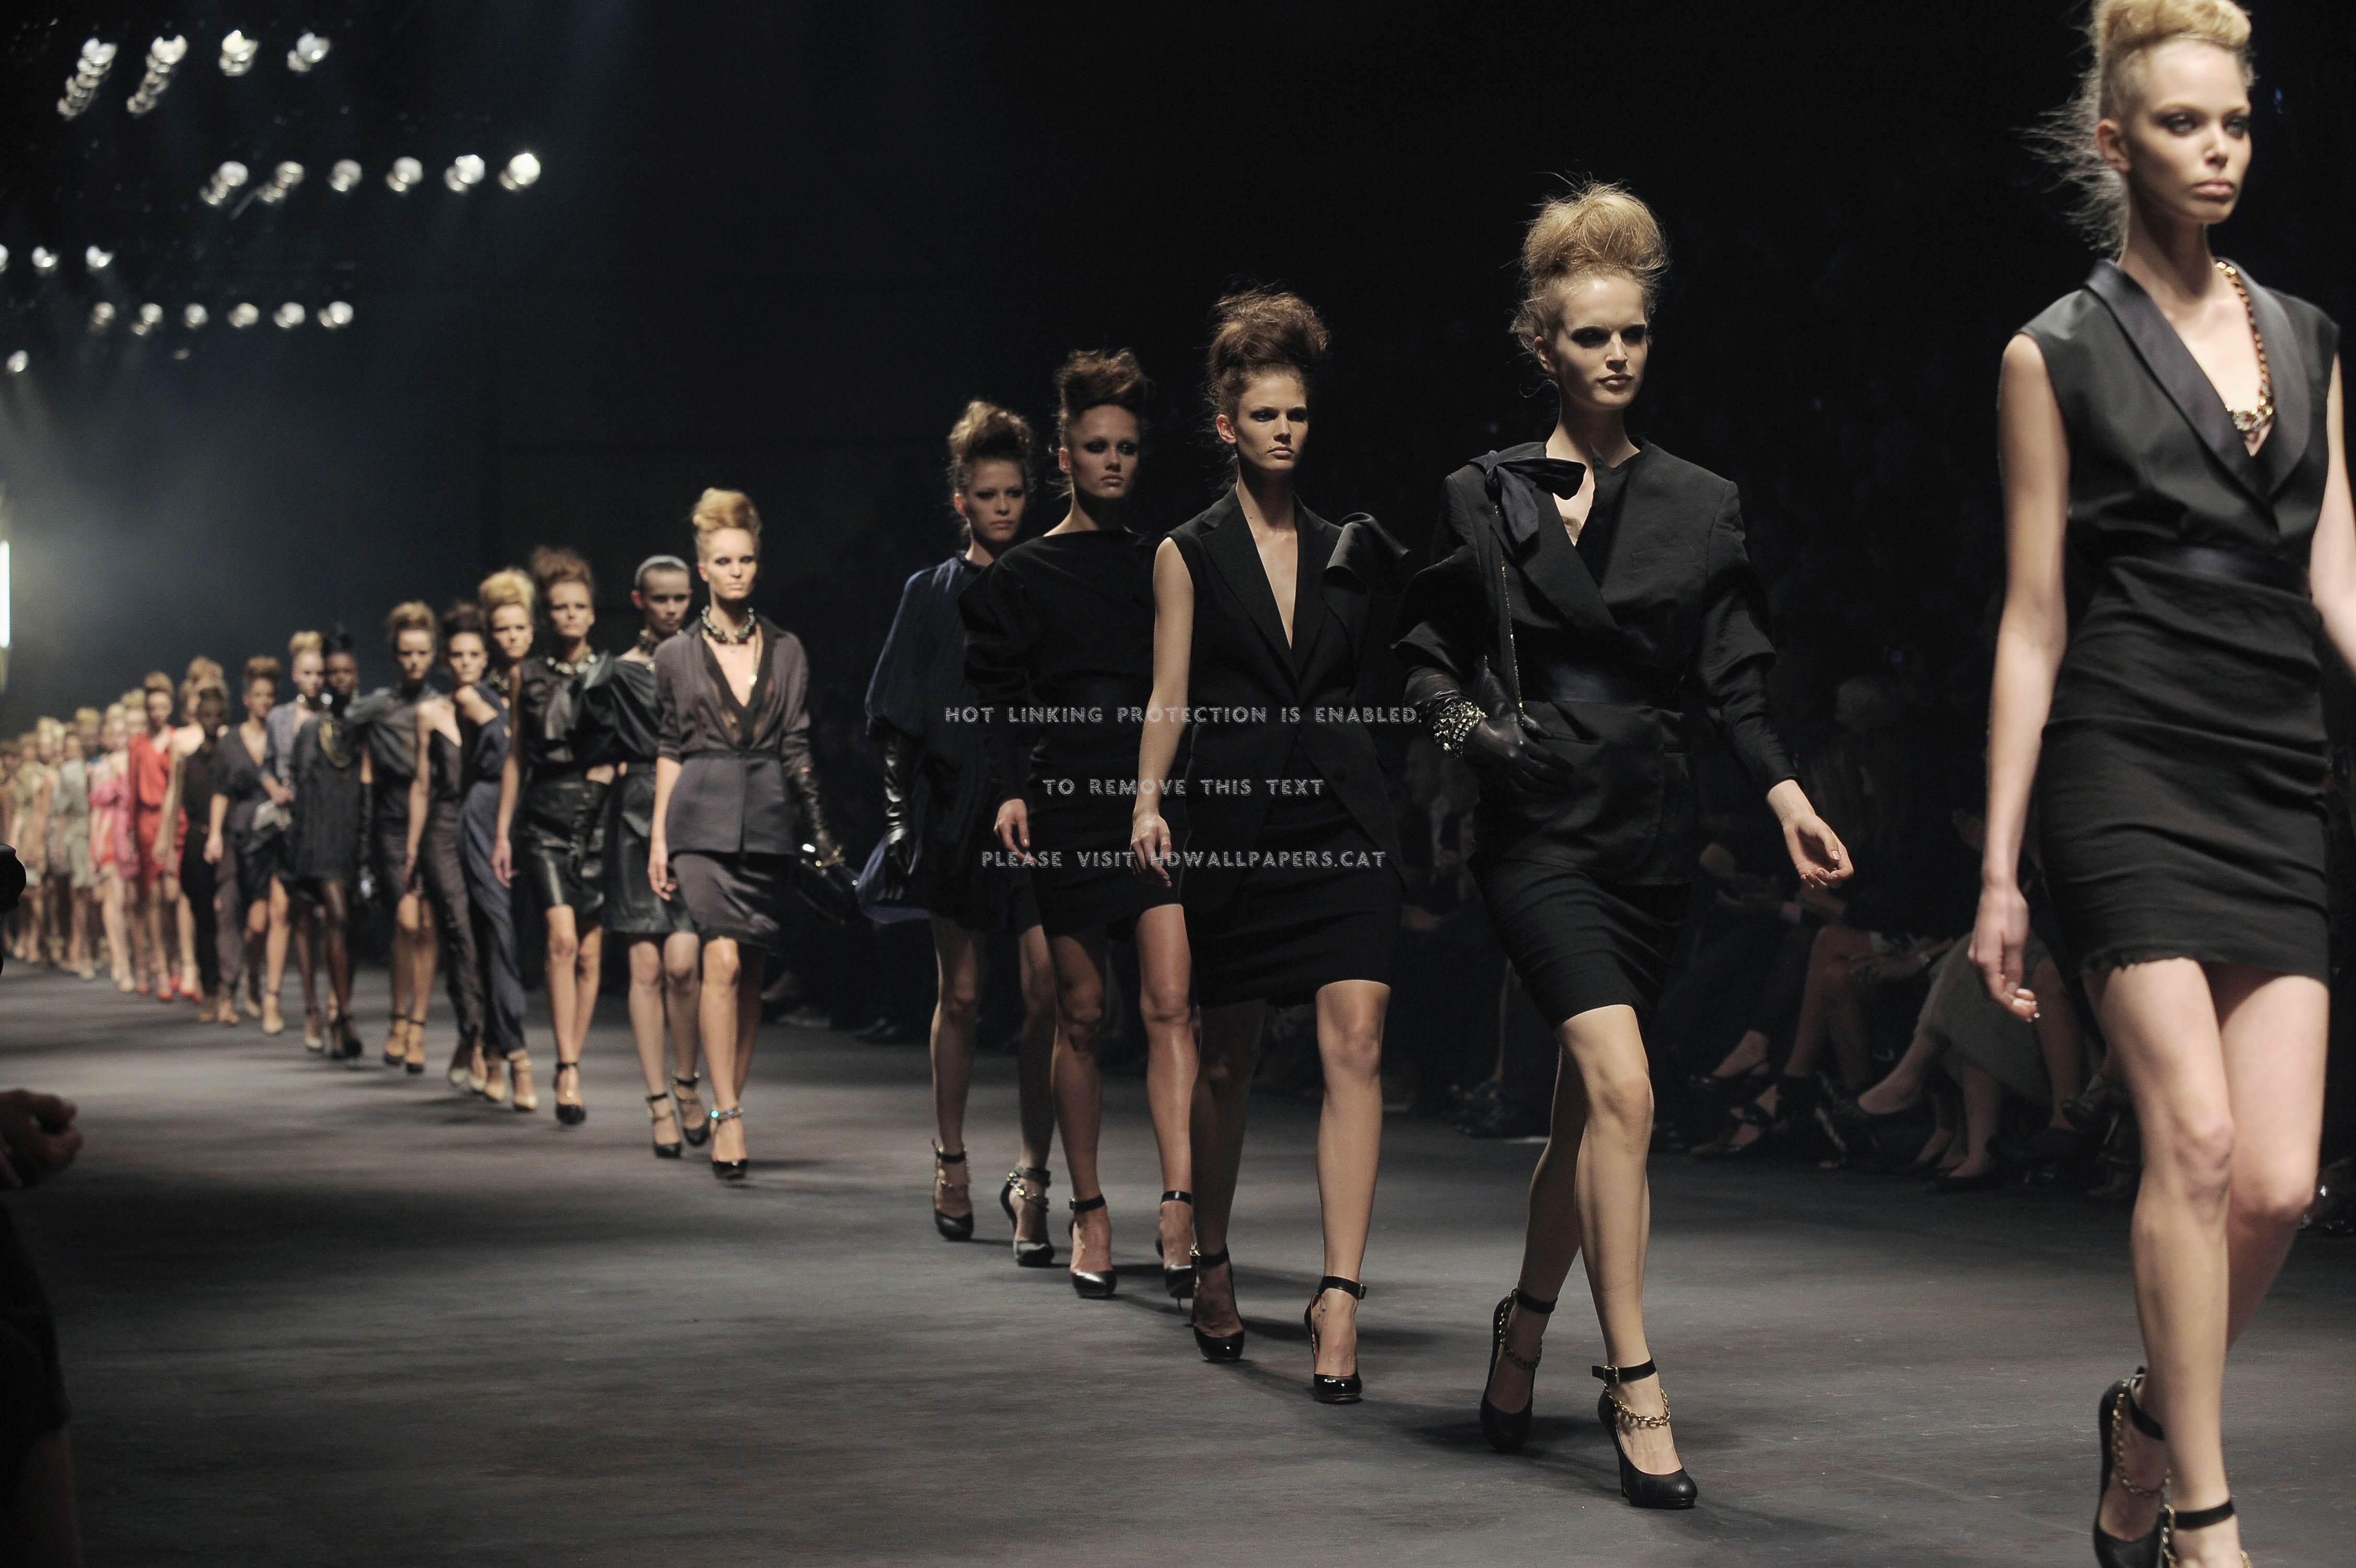 lanvin ss10 01 fashion week runway catwalk 4508x3000